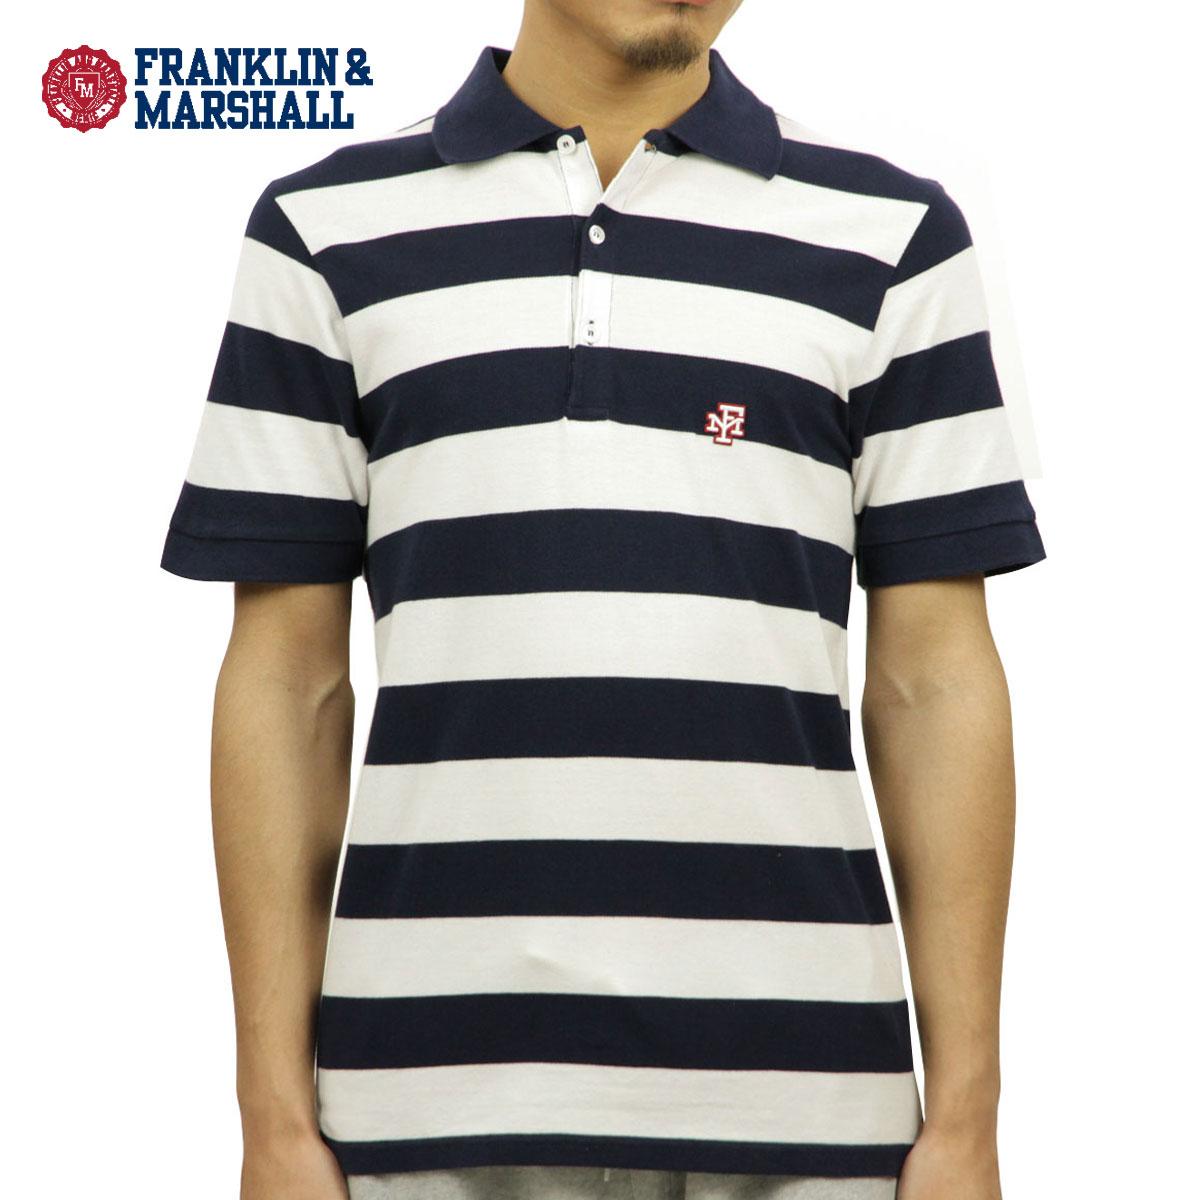 c50957314fc Franklin Marshal FRANKLIN & MARSHALL regular store men stripe short  sleeves polo shirt STRIPE POLO ...